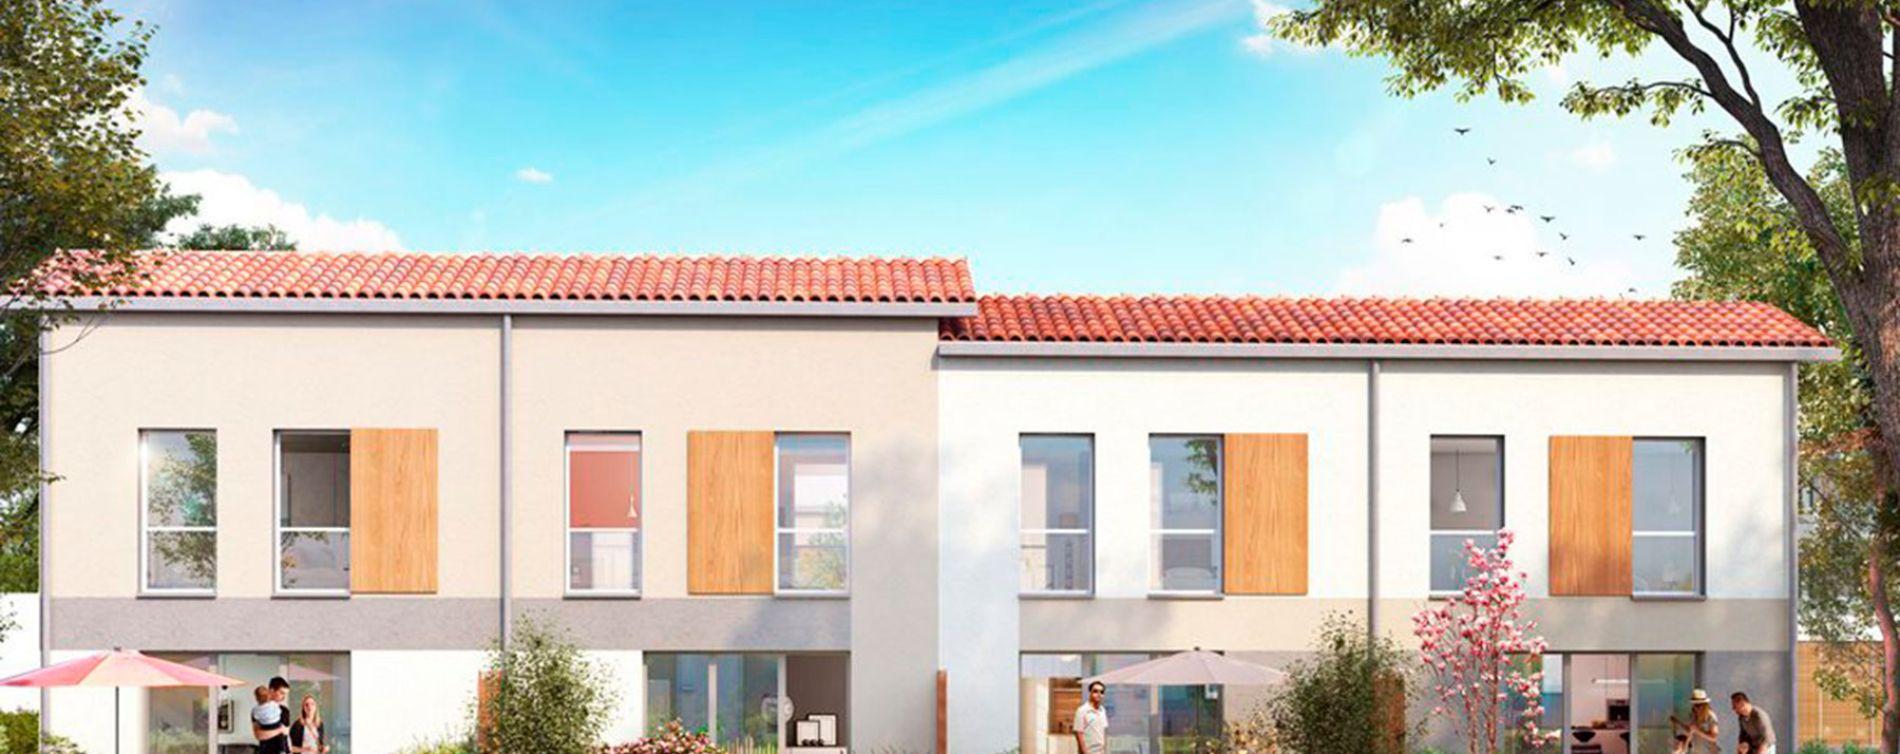 Izon : programme immobilier neuve « Dolce Villa » (2)